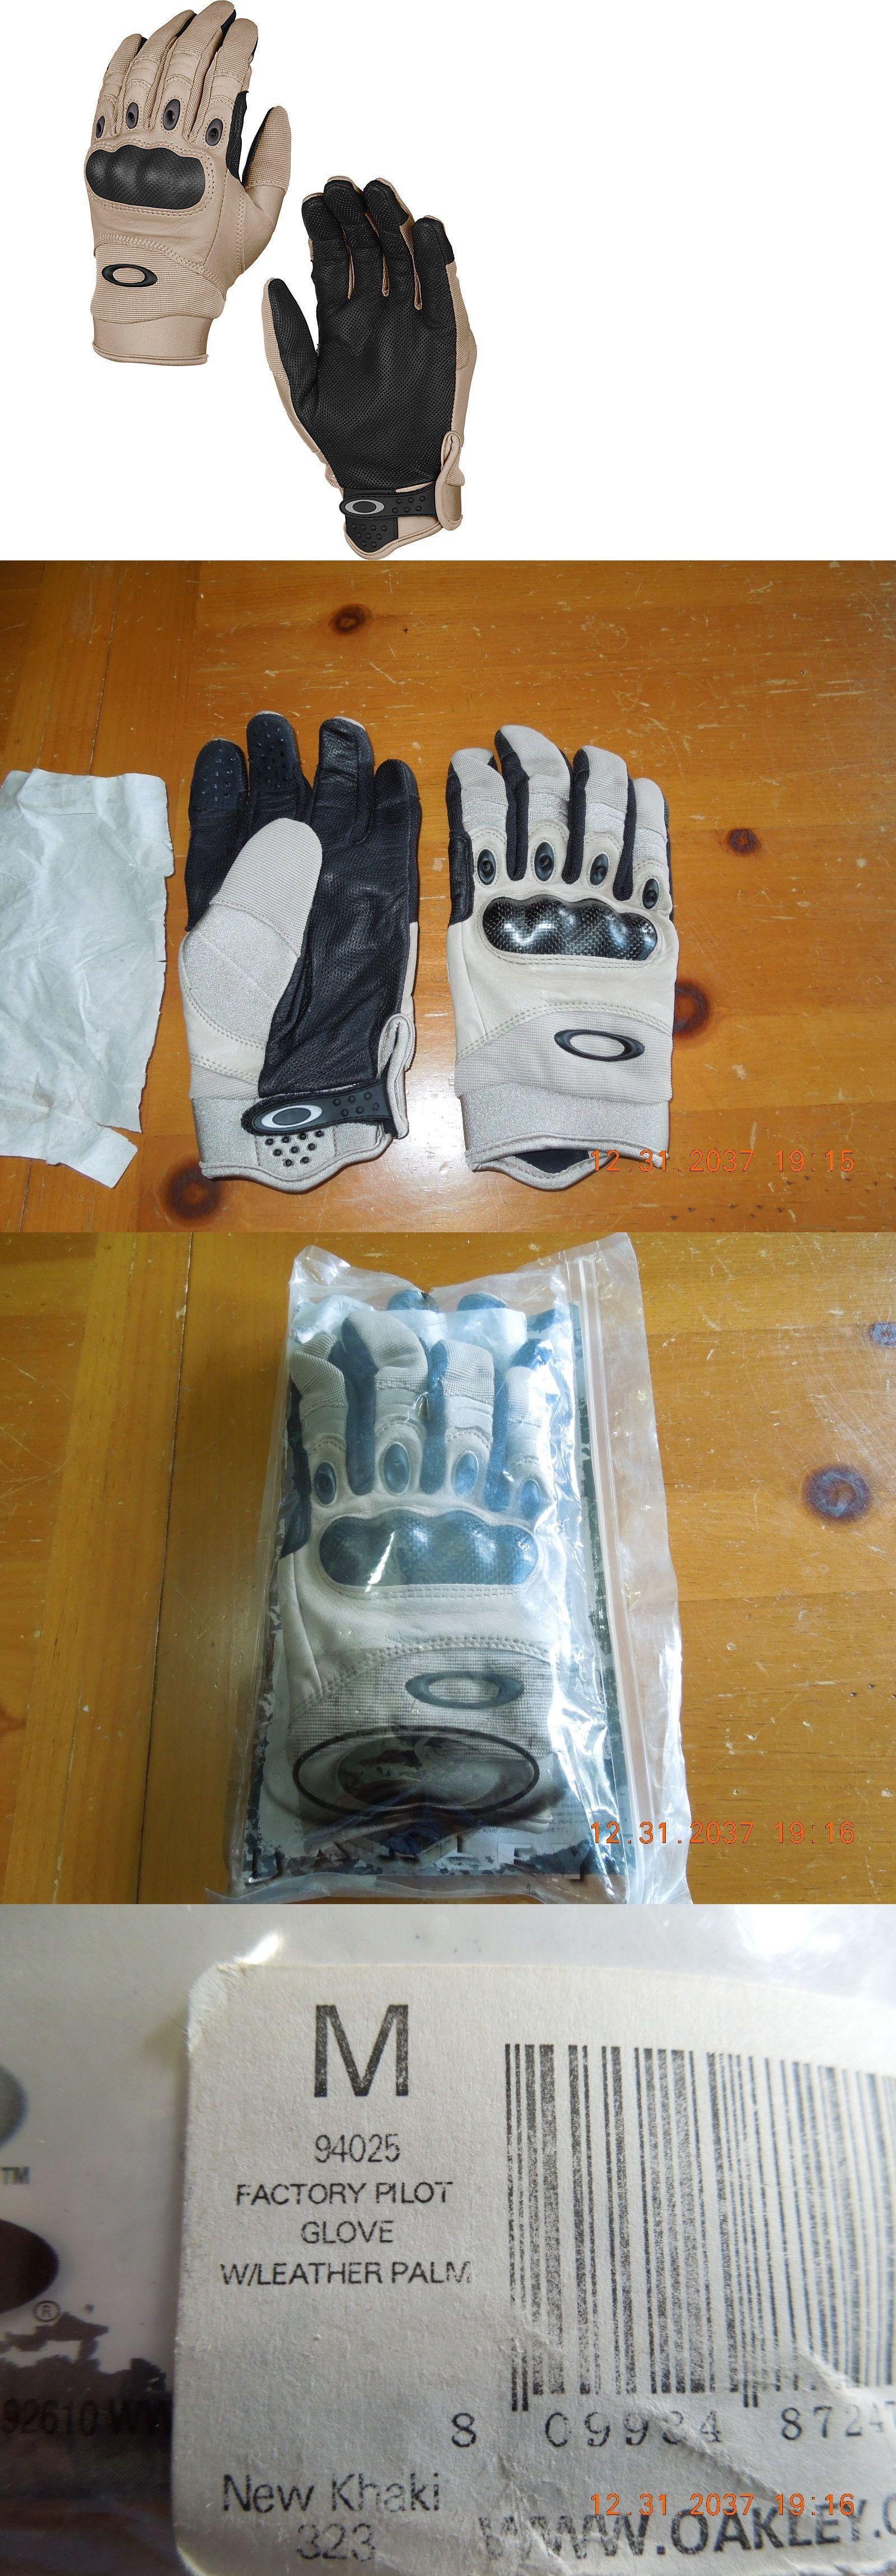 587418048c Tactical Gloves 177898  New Oakley Si Factory Pilot Assault Glove Tactical  Ns Khaki 94025 Large